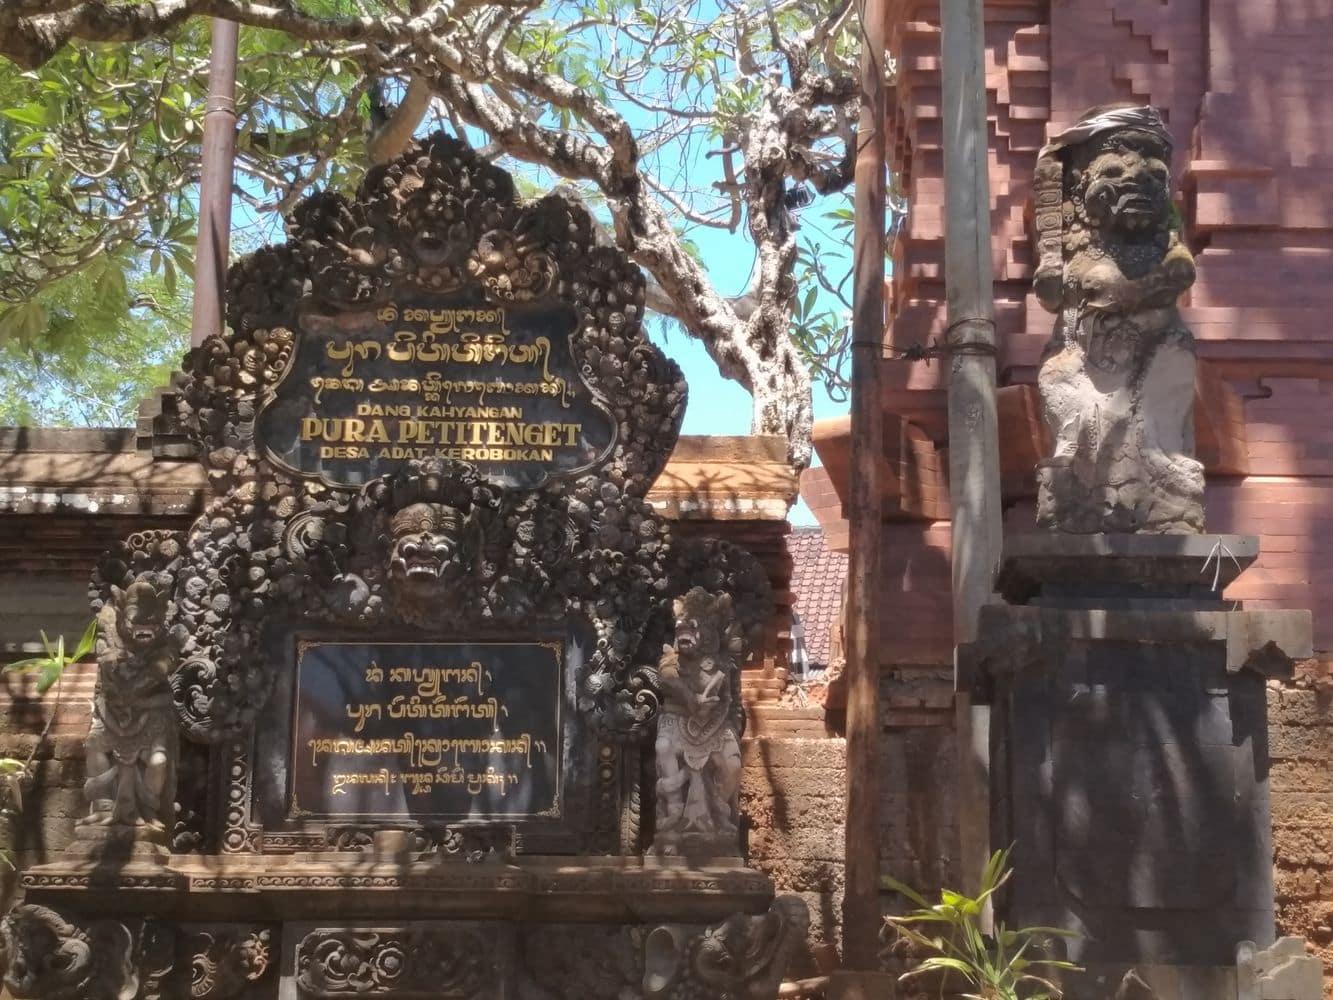 Petitenget Temple Kuta Bali Entry Fee Dress Code Pura 00019